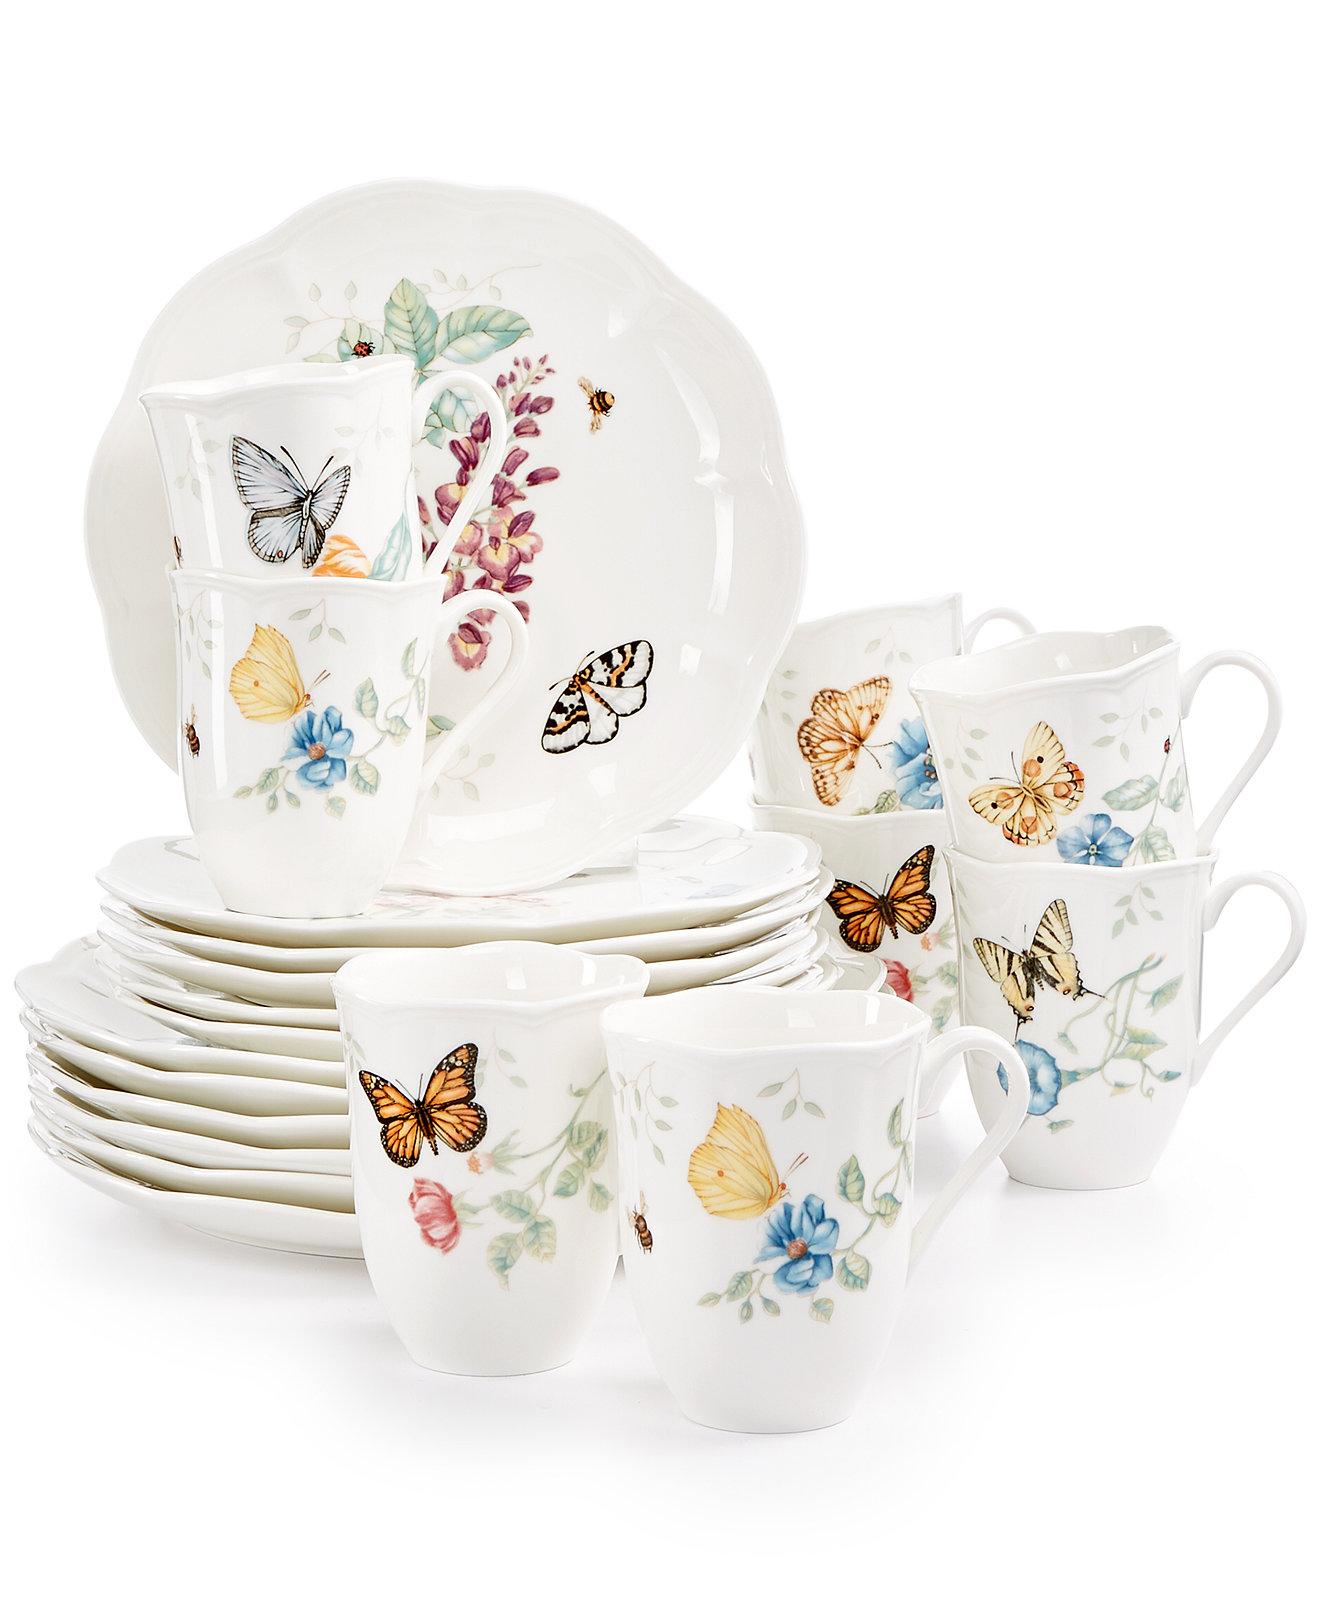 dinnerware sets  fine china wedding gifts - lenox butterfly meadow piece dinnerware set   bonus mugs a macy'sexclusive